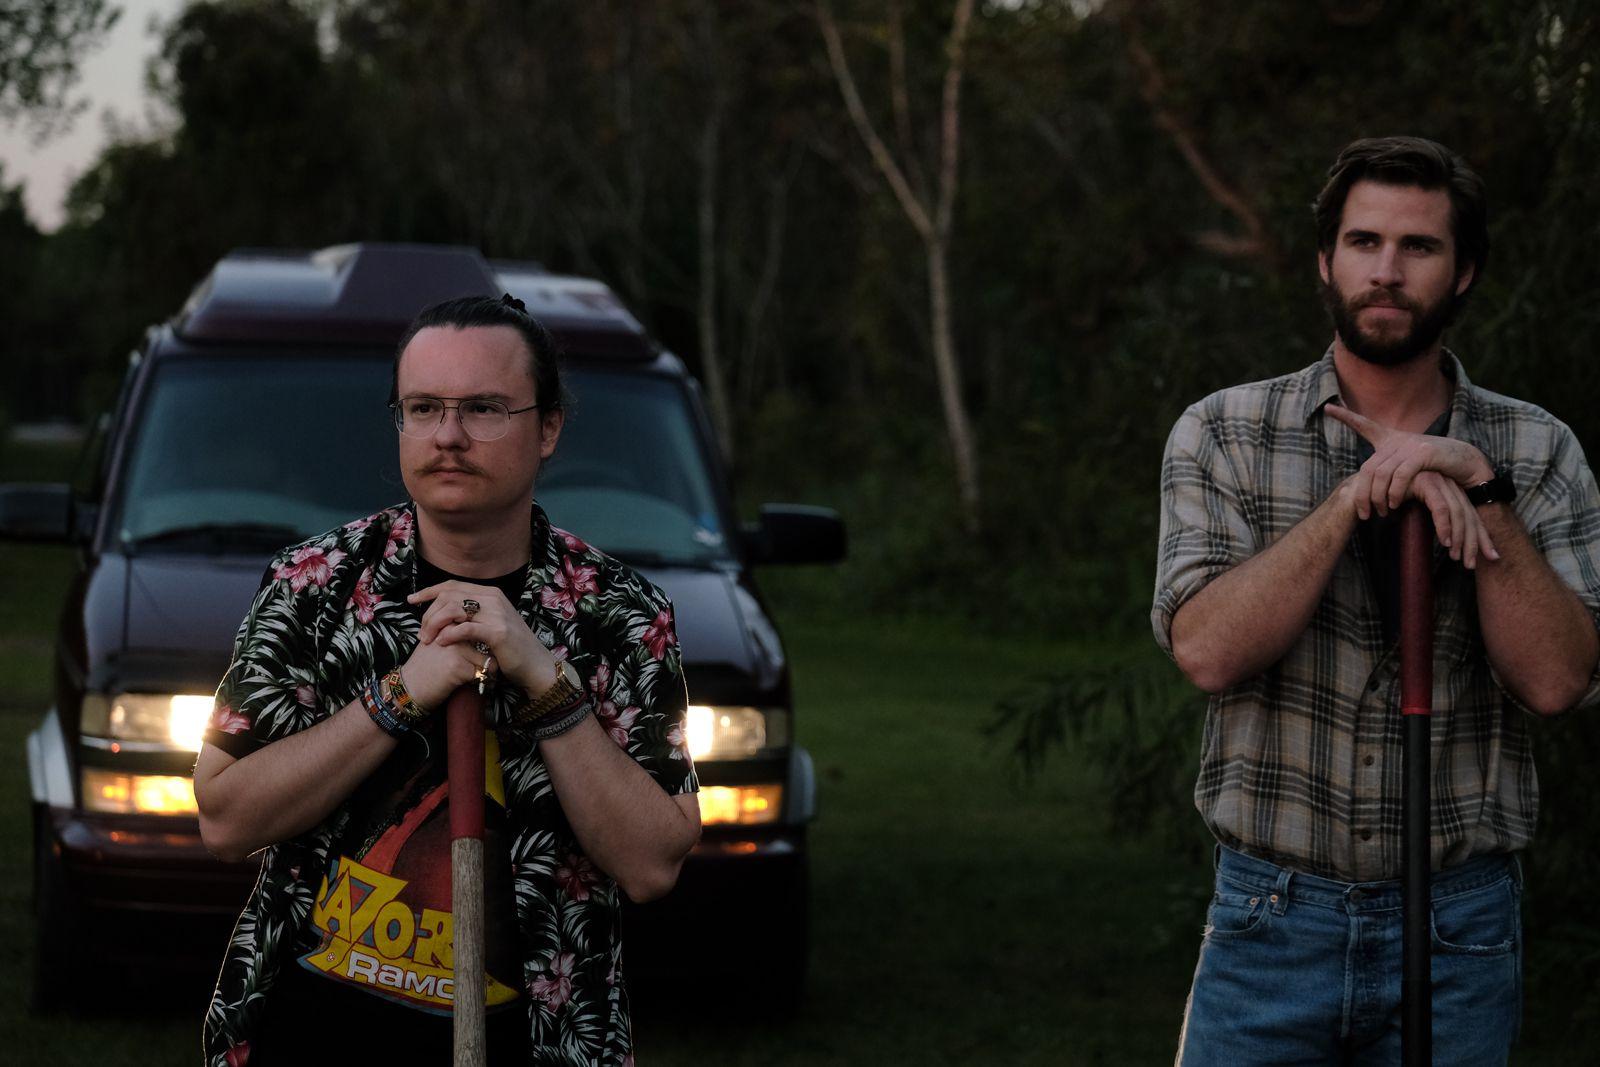 Arkansas (BANDE-ANNONCE) avec Vince Vaughn, Liam Hemsworth, John Malkovich